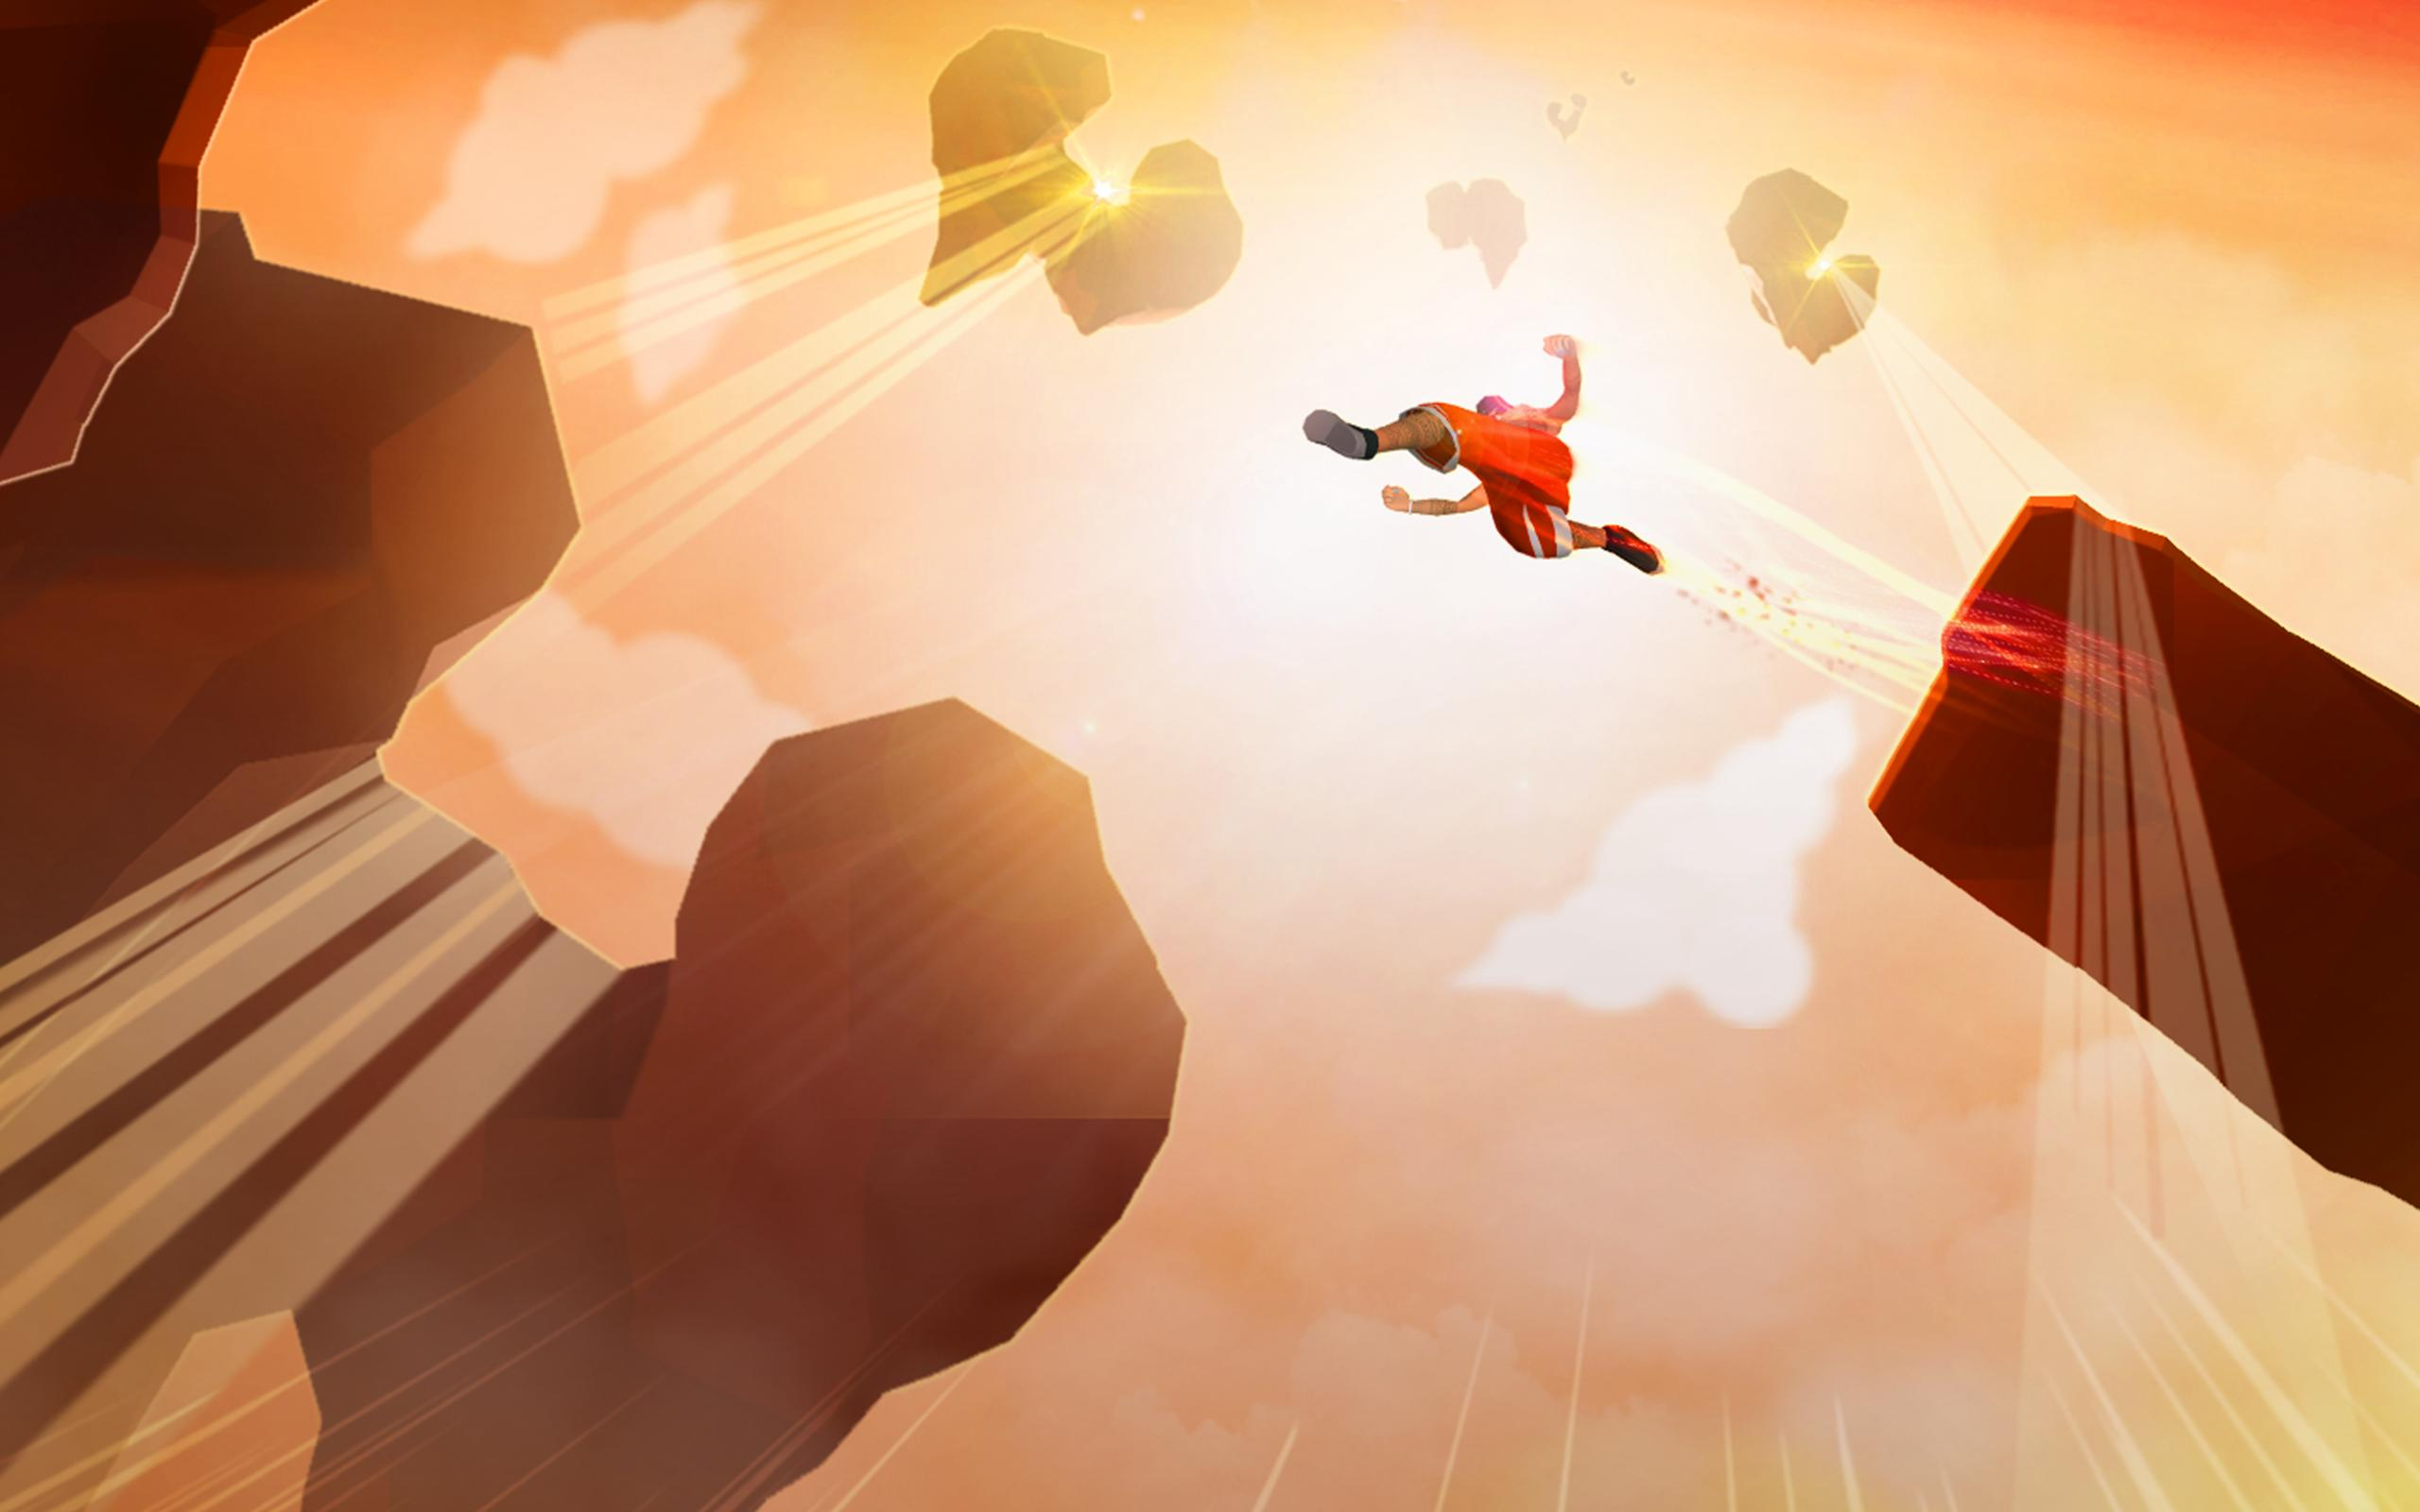 Sky Dancer Run - Running Game 4.2.0 Screenshot 9